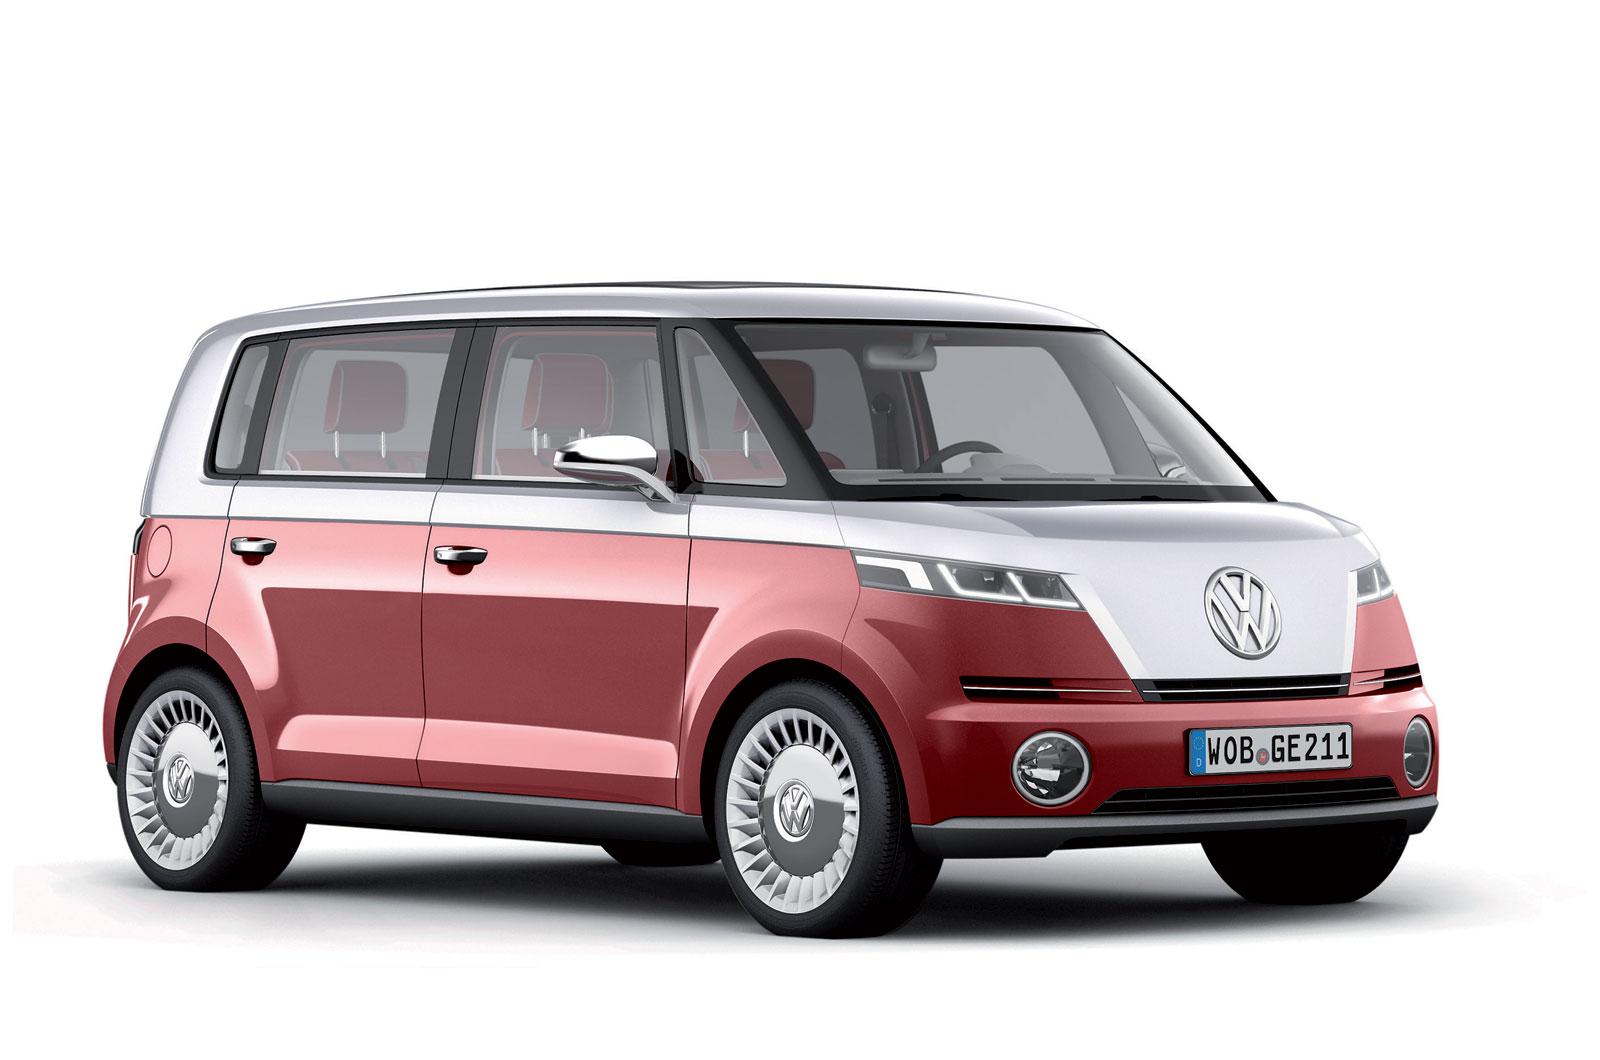 http://2.bp.blogspot.com/-D9qatMZoVM0/T-N5-ISUjMI/AAAAAAAAD10/33WHLK9FQY4/s1600/Volkswagen+Bulli+Concept+Hd+Wallpapers+2011_.jpg